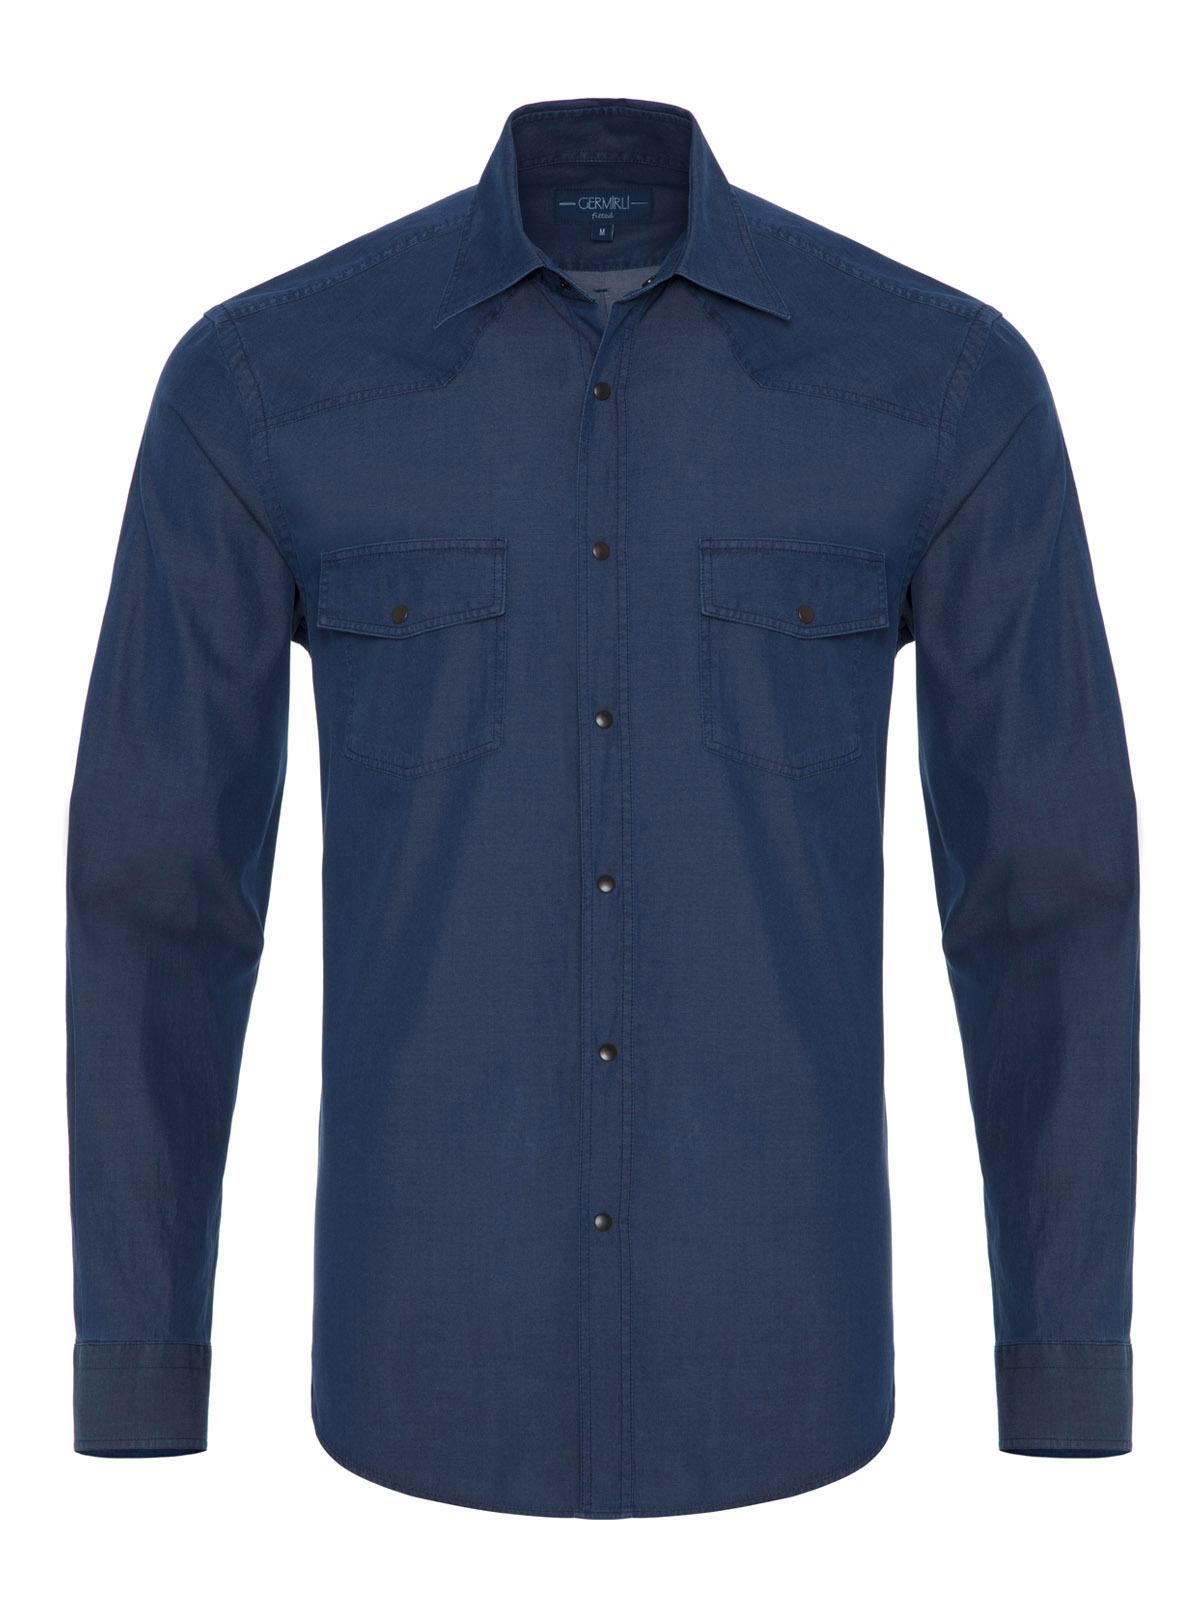 Germirli - Germirli Lacivert Denim Cepli Overshirt Tailor Fit Gömlek